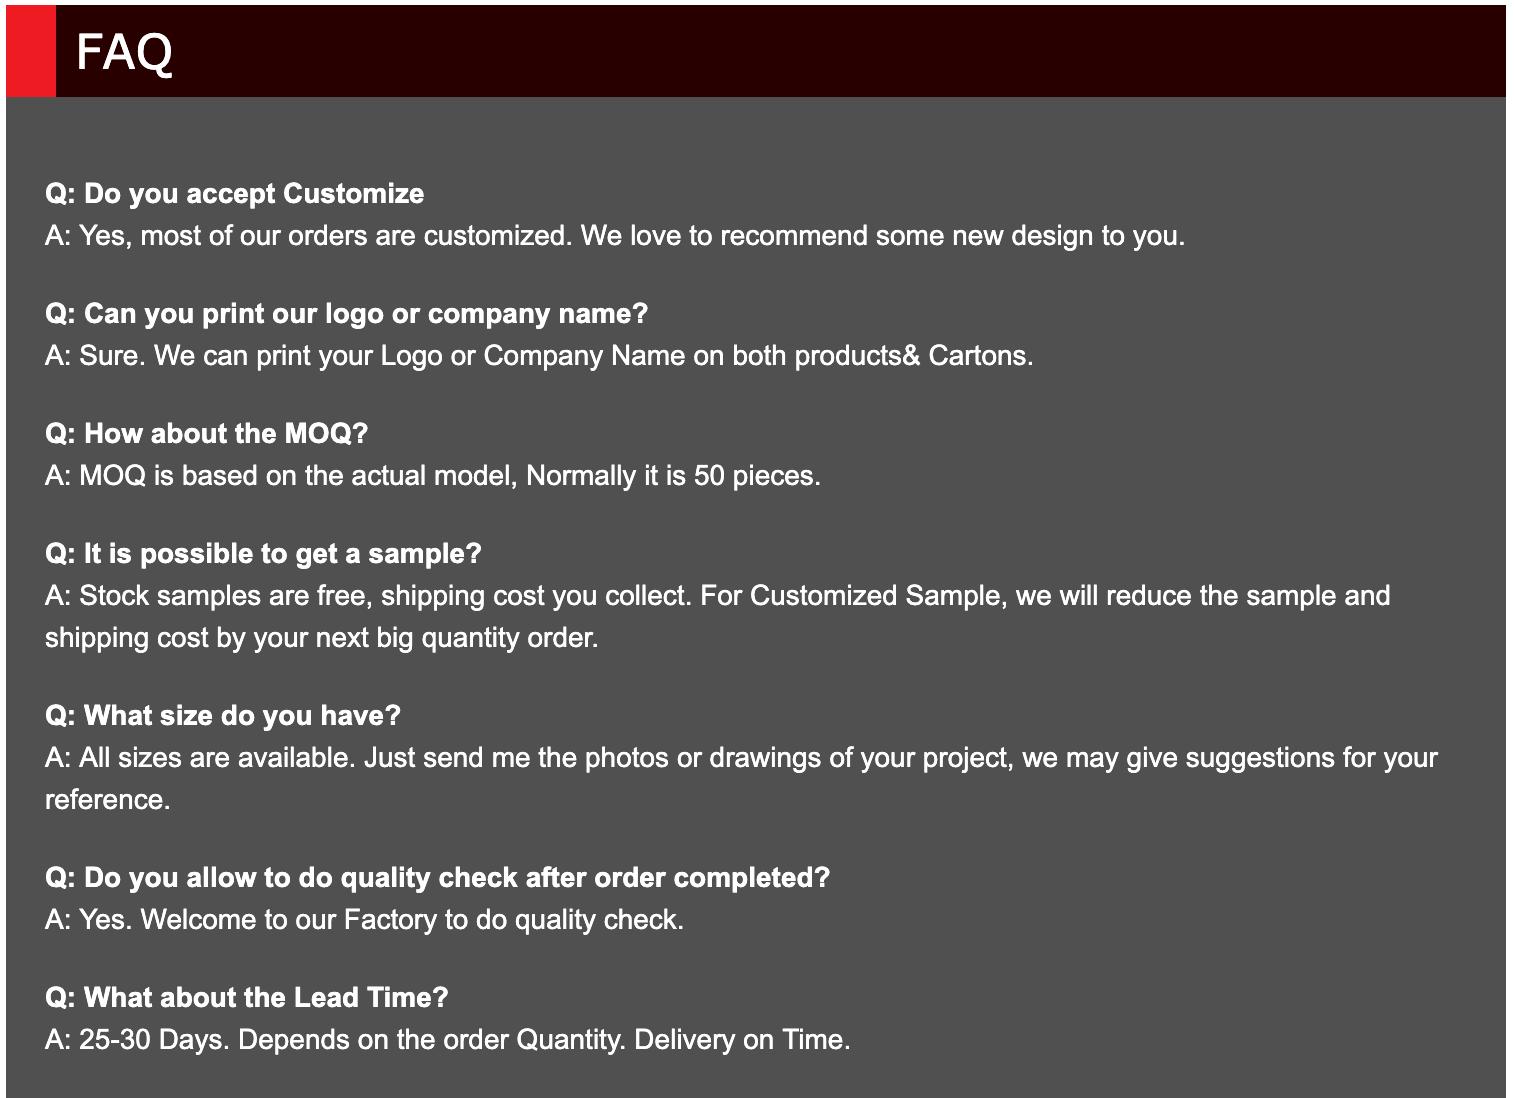 Framed Mirror Manufacturers FAQ